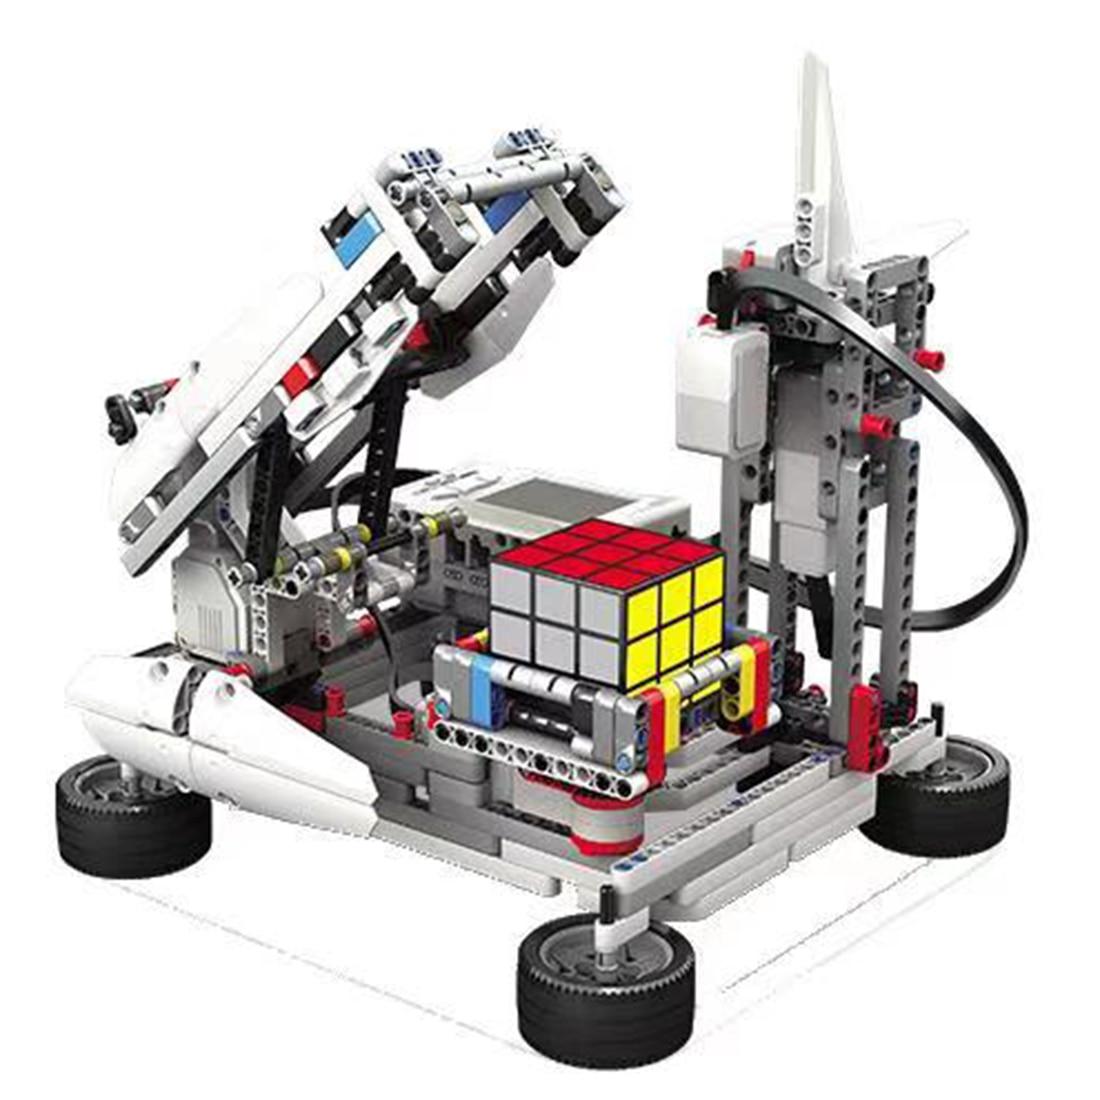 Programmable Building Block Assembly Robot Kit DIY Multifunctional Educational Learning Kit